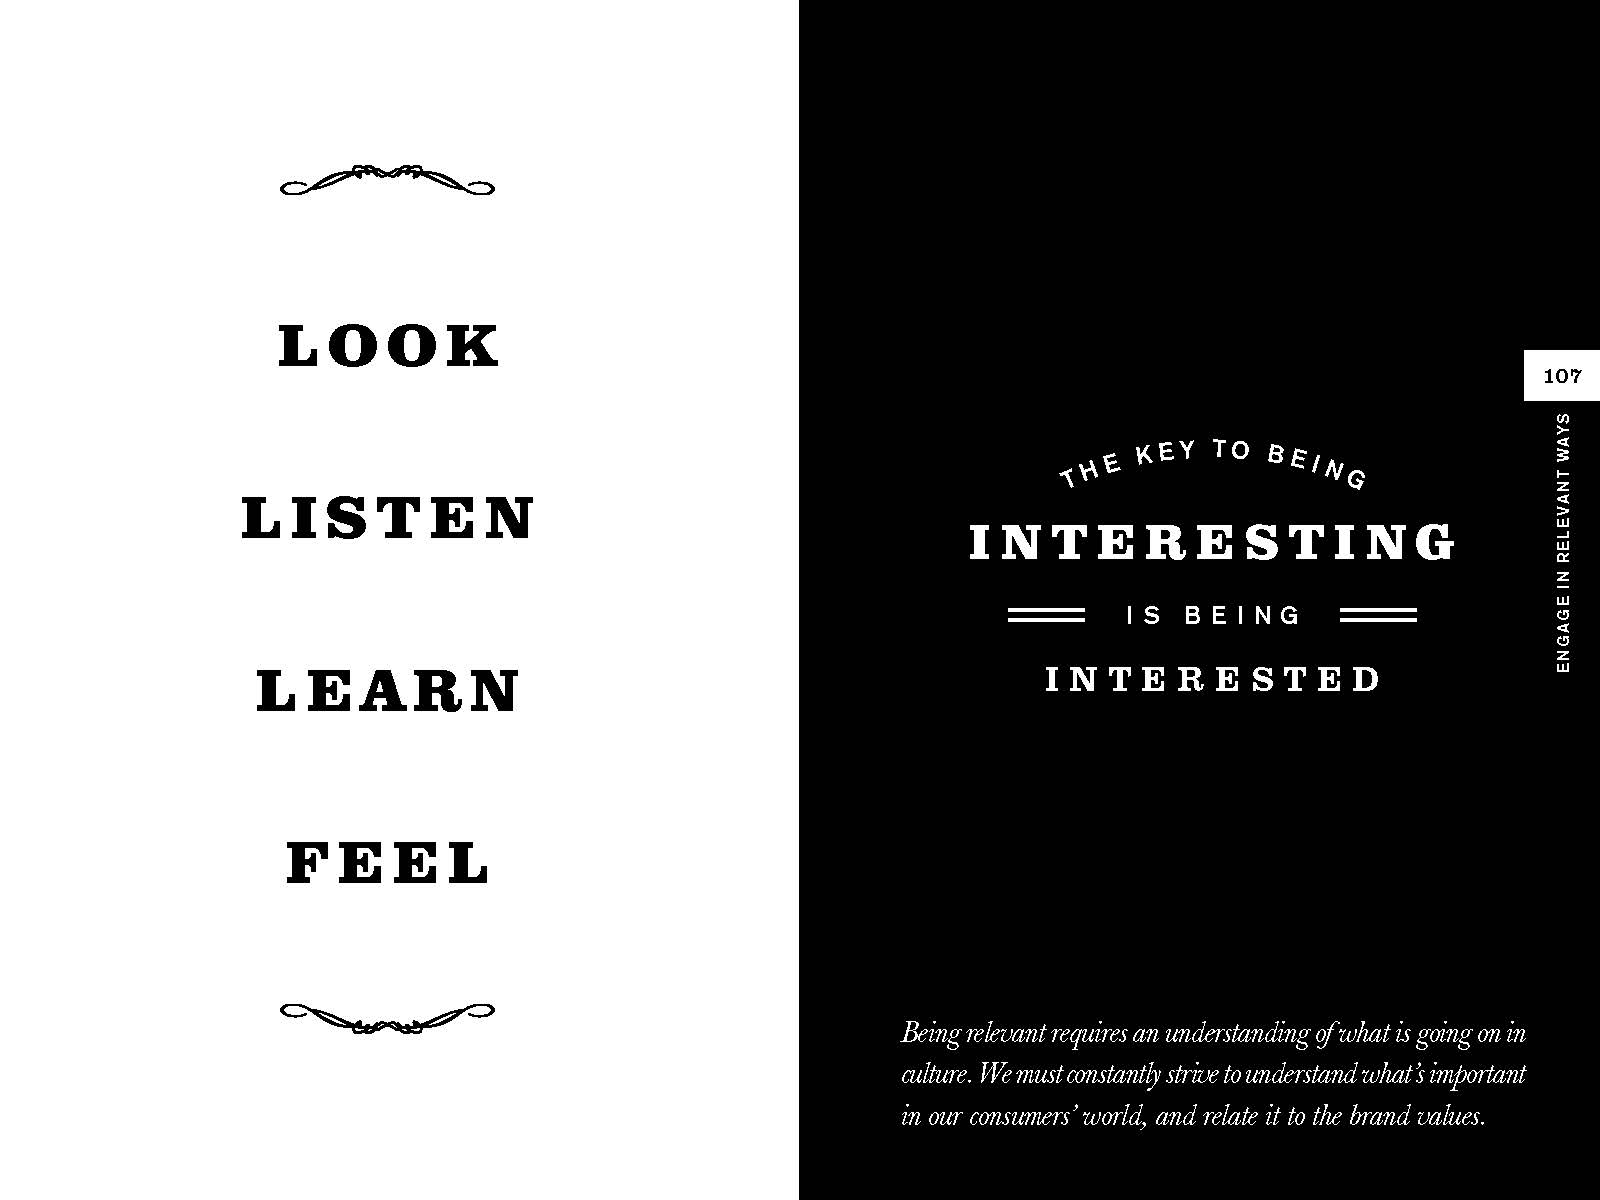 Jack Daniel's Guiding Principles 2012_Page_57.jpg